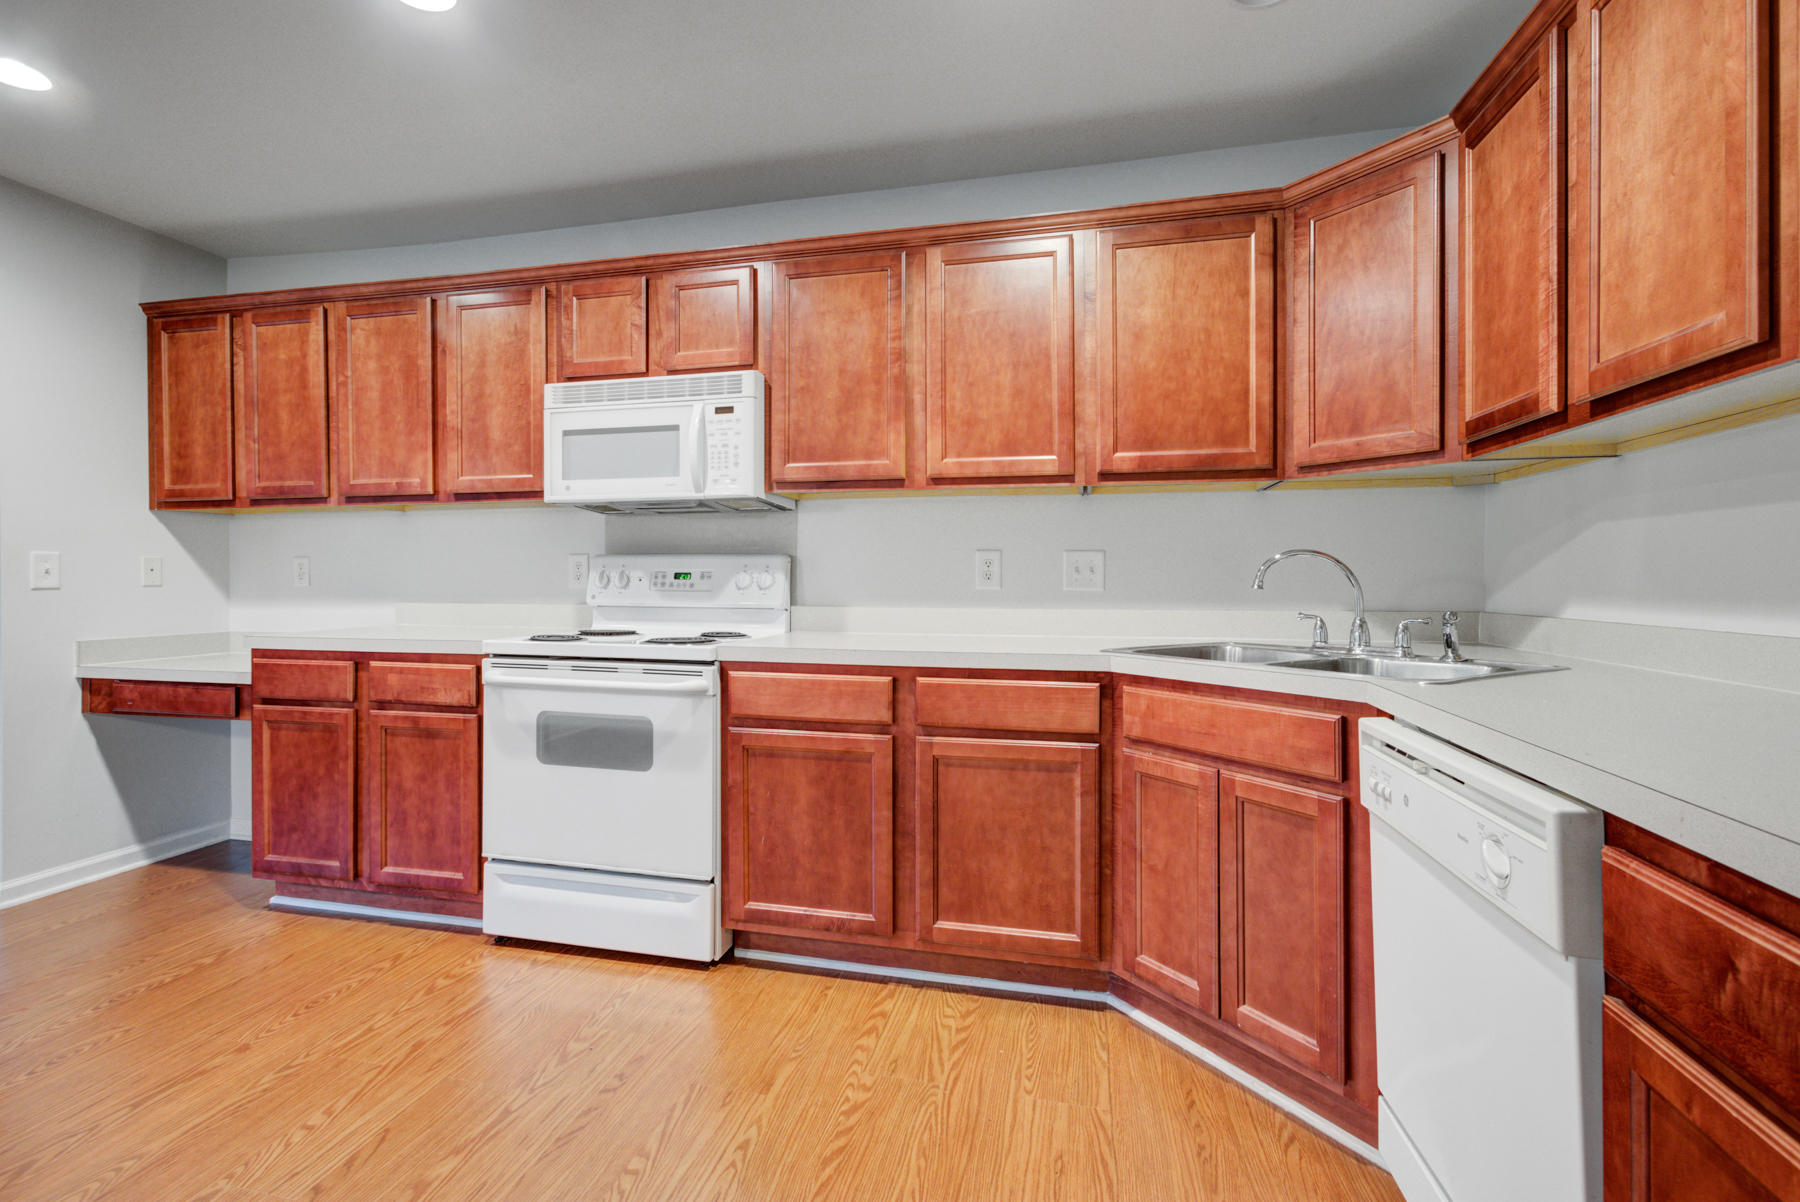 Grand Oaks Plantation Homes For Sale - 564 Hainesworth, Charleston, SC - 3